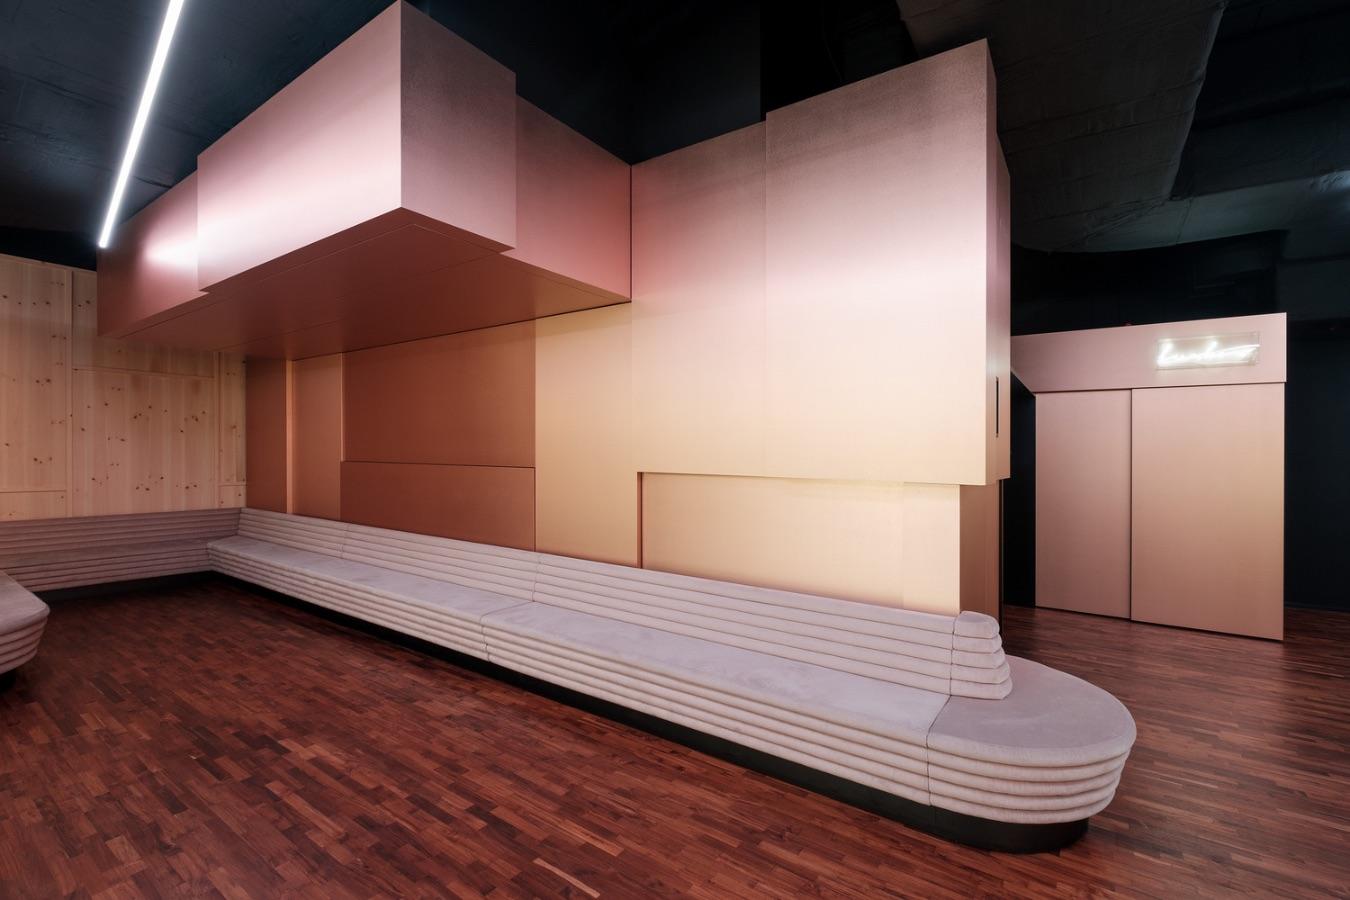 8_Delphi LUX Cinema_Batek Architekten+Ester Bruzkus Architekten_Inspirationist